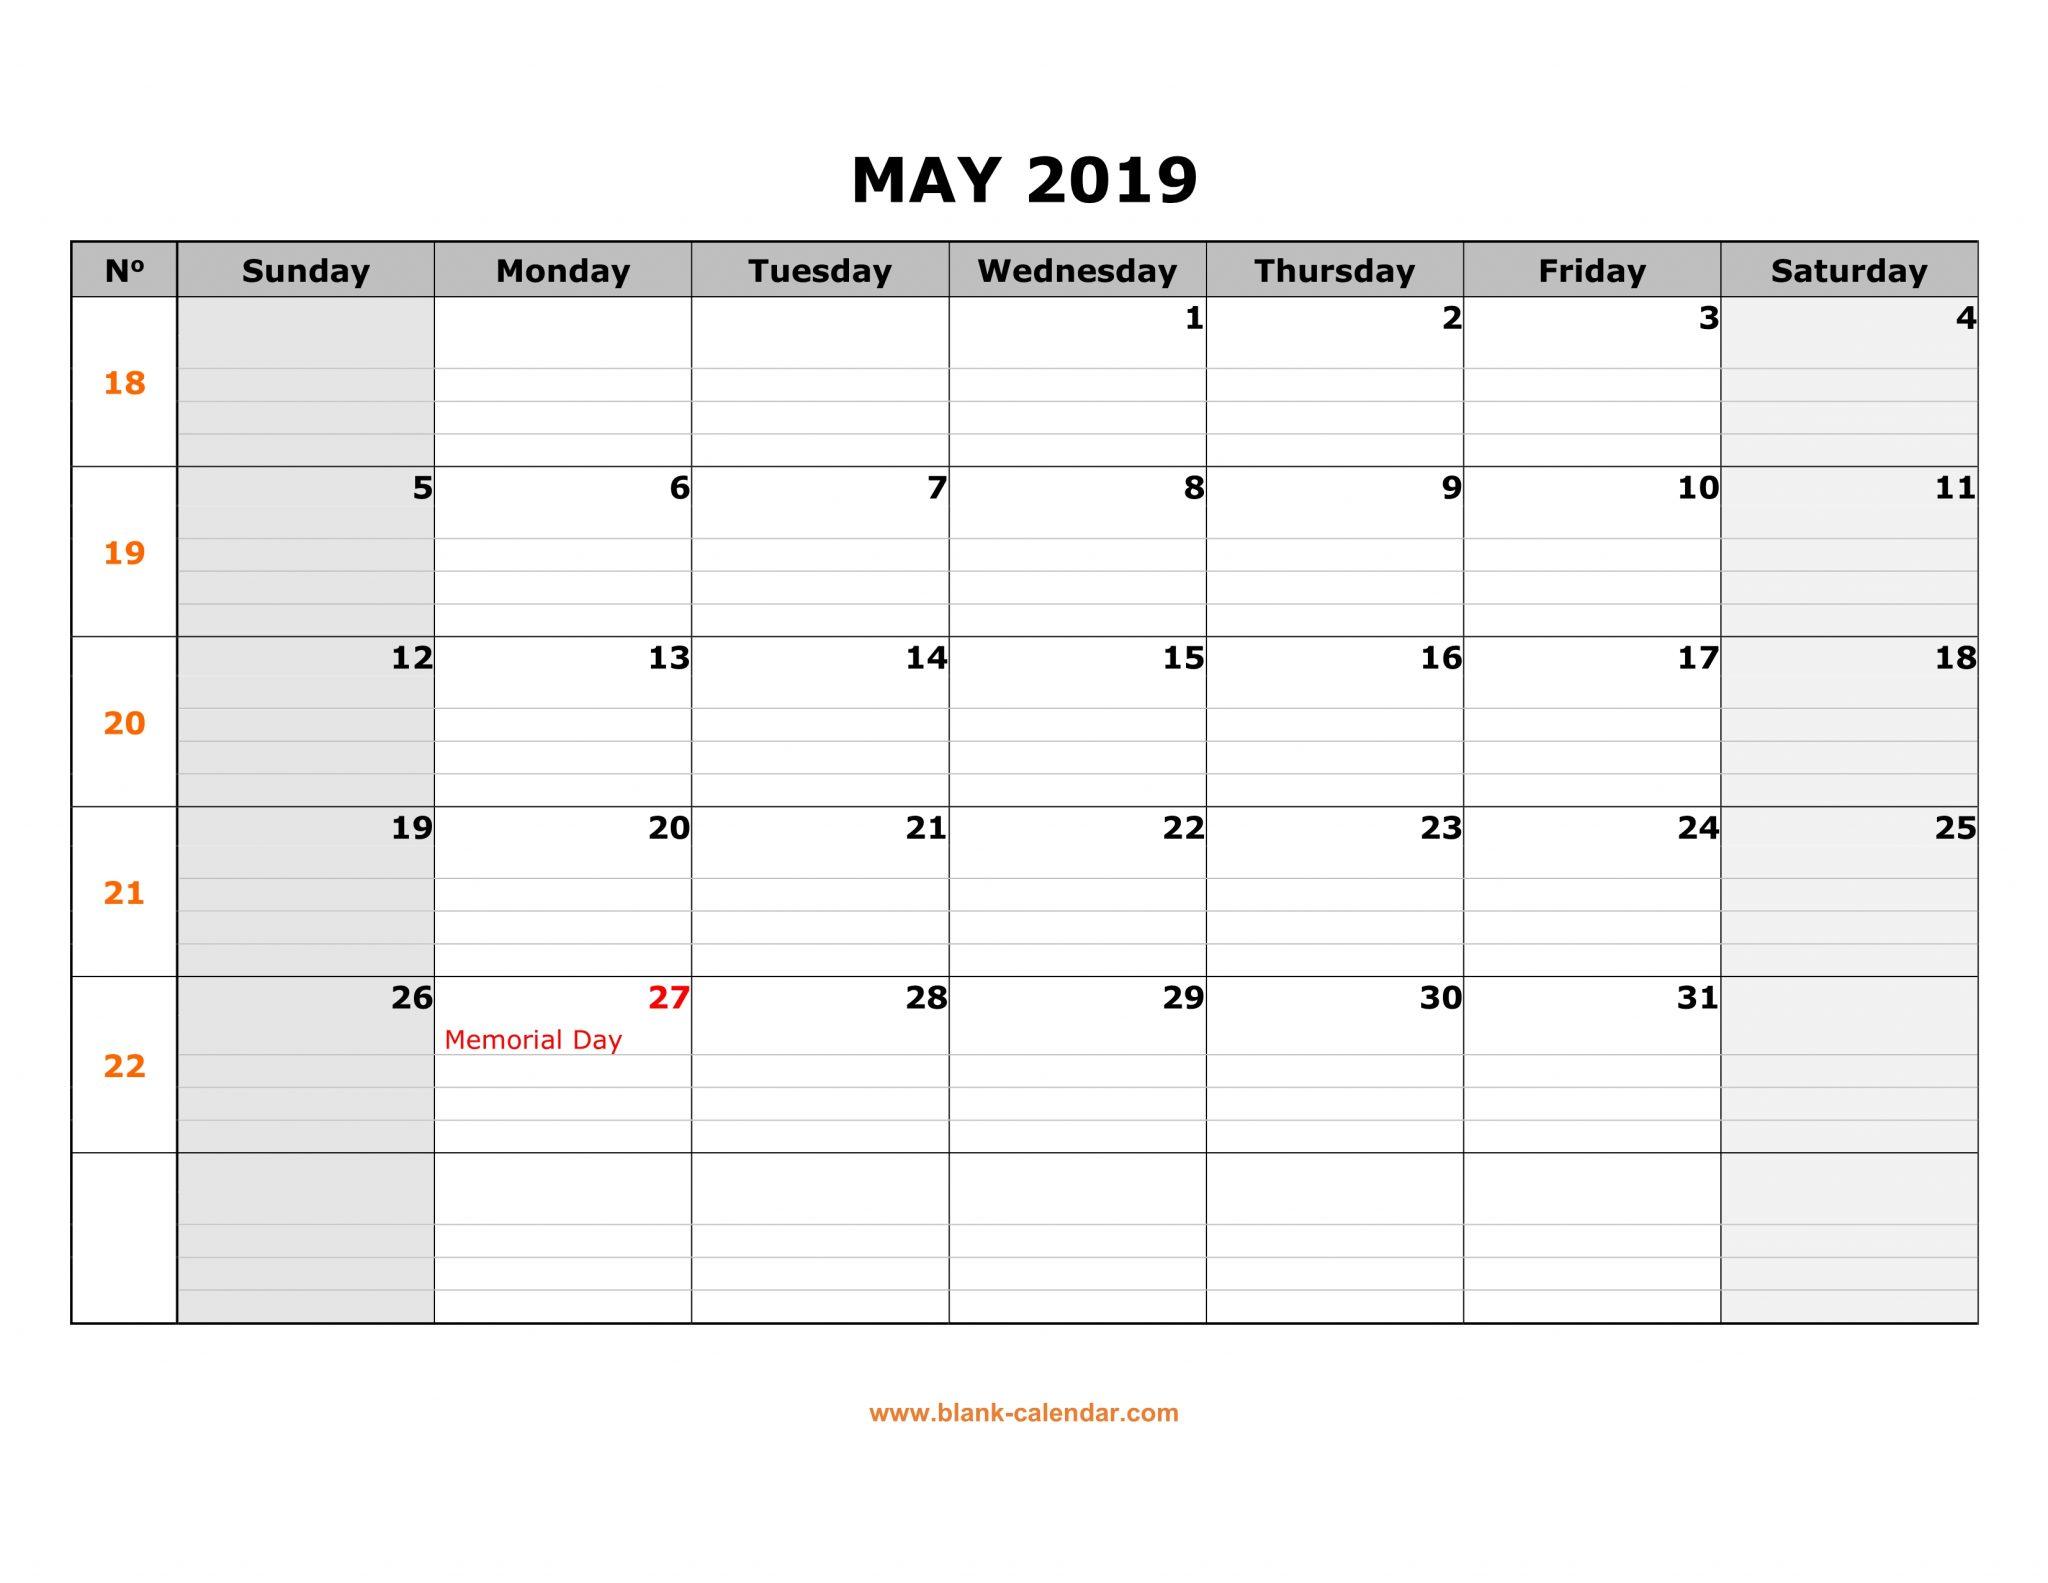 Calendar of May 2019